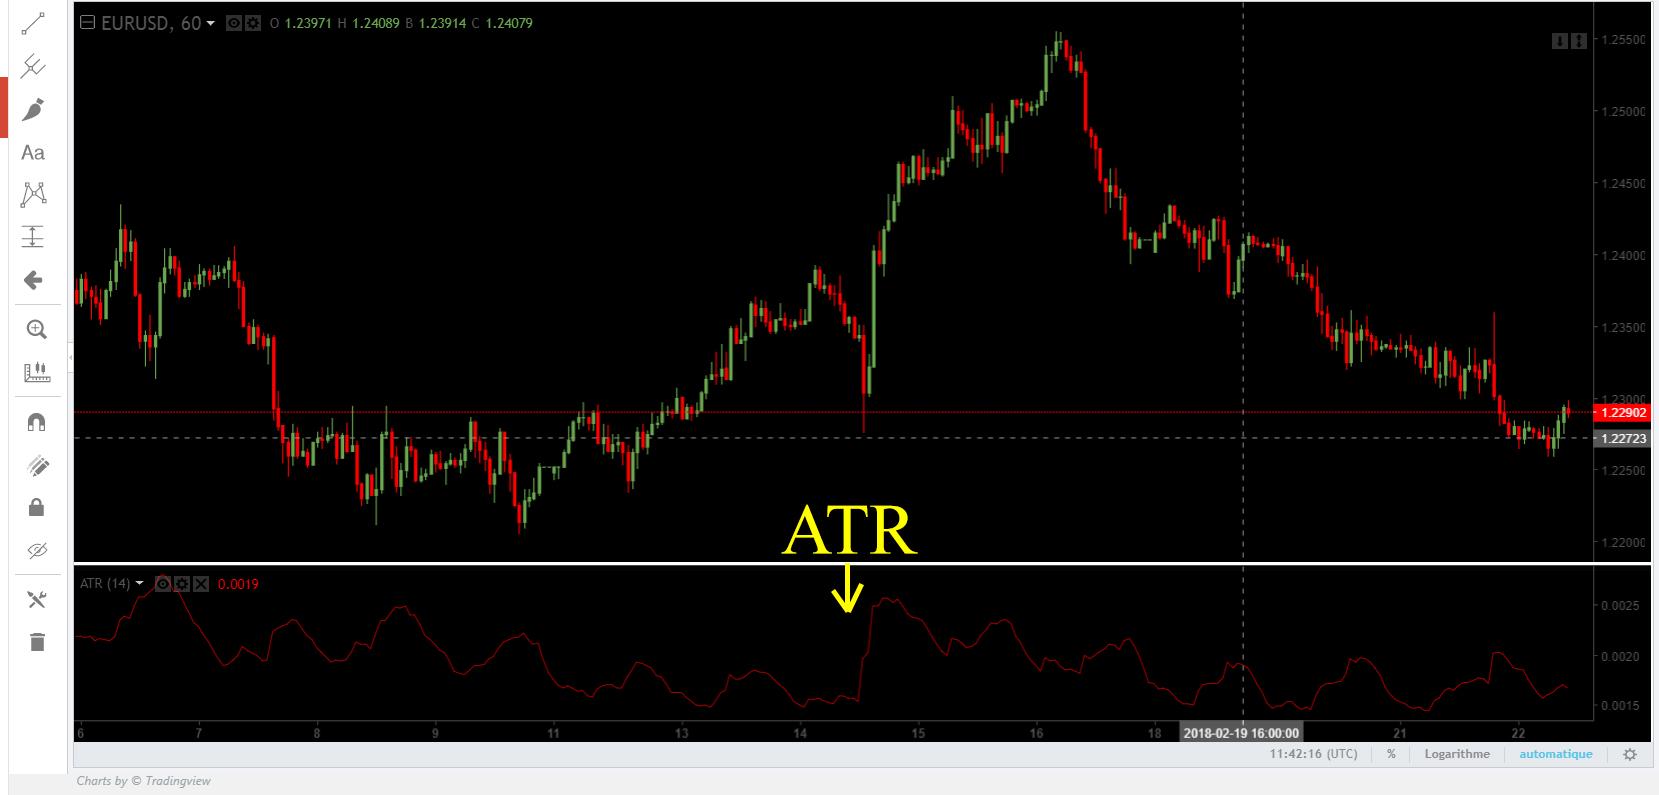 ATR sur graphique